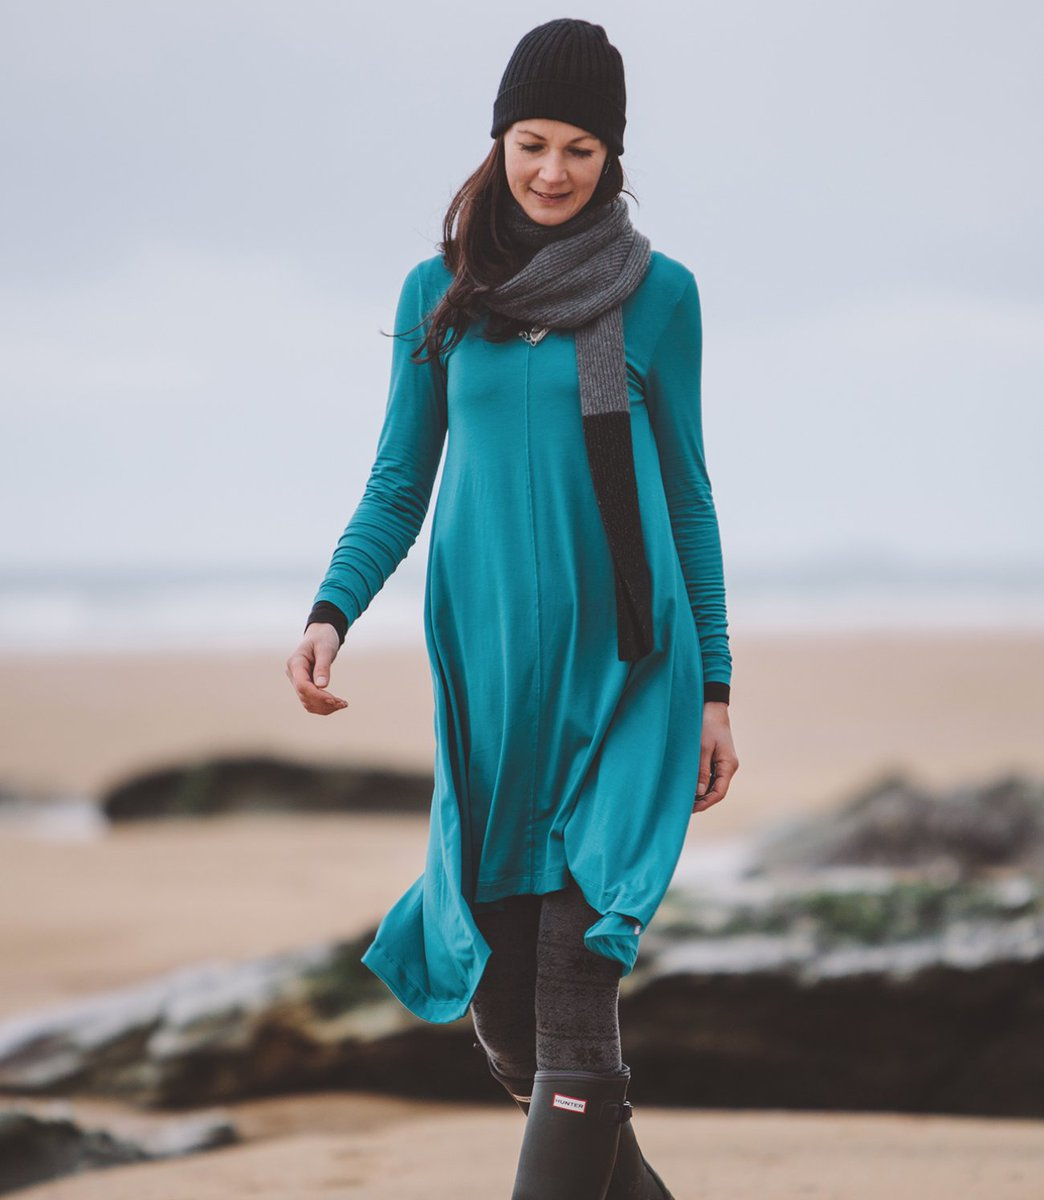 bc2d67b9c5f15 ... hem add a feminine touch to a classic style. 95% Tencel (Eucalyptus) 5%  Elastane http   ow.ly qrxu30mCUAW  fashion   organicpic.twitter.com j1Av7FlowW